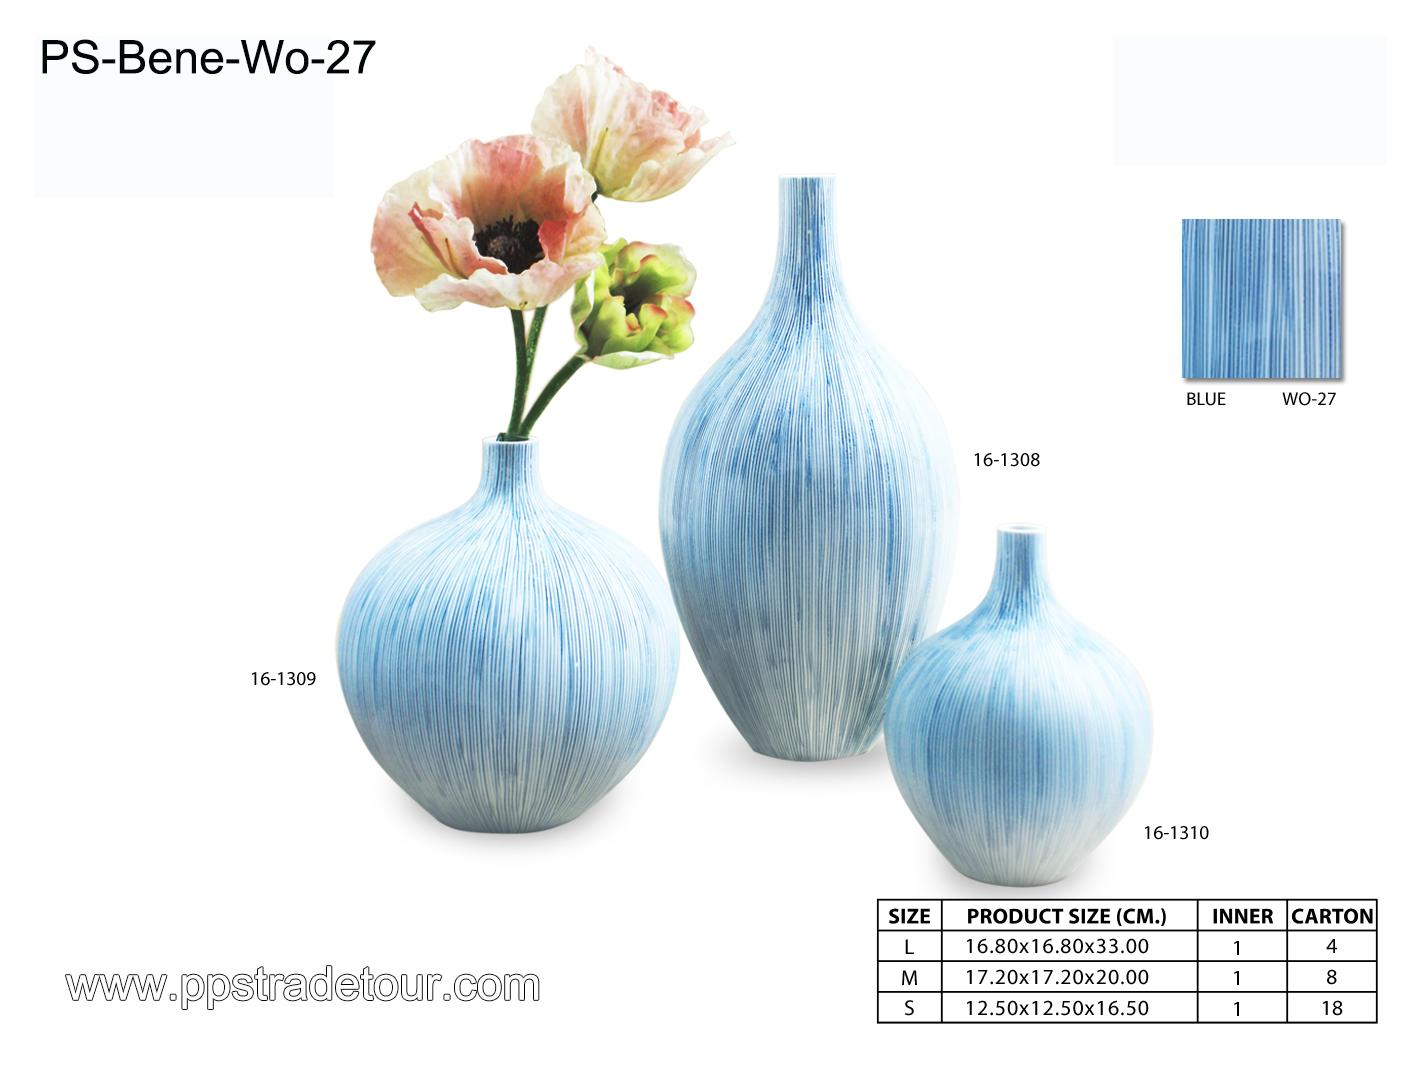 PSCV-bene-wo-27